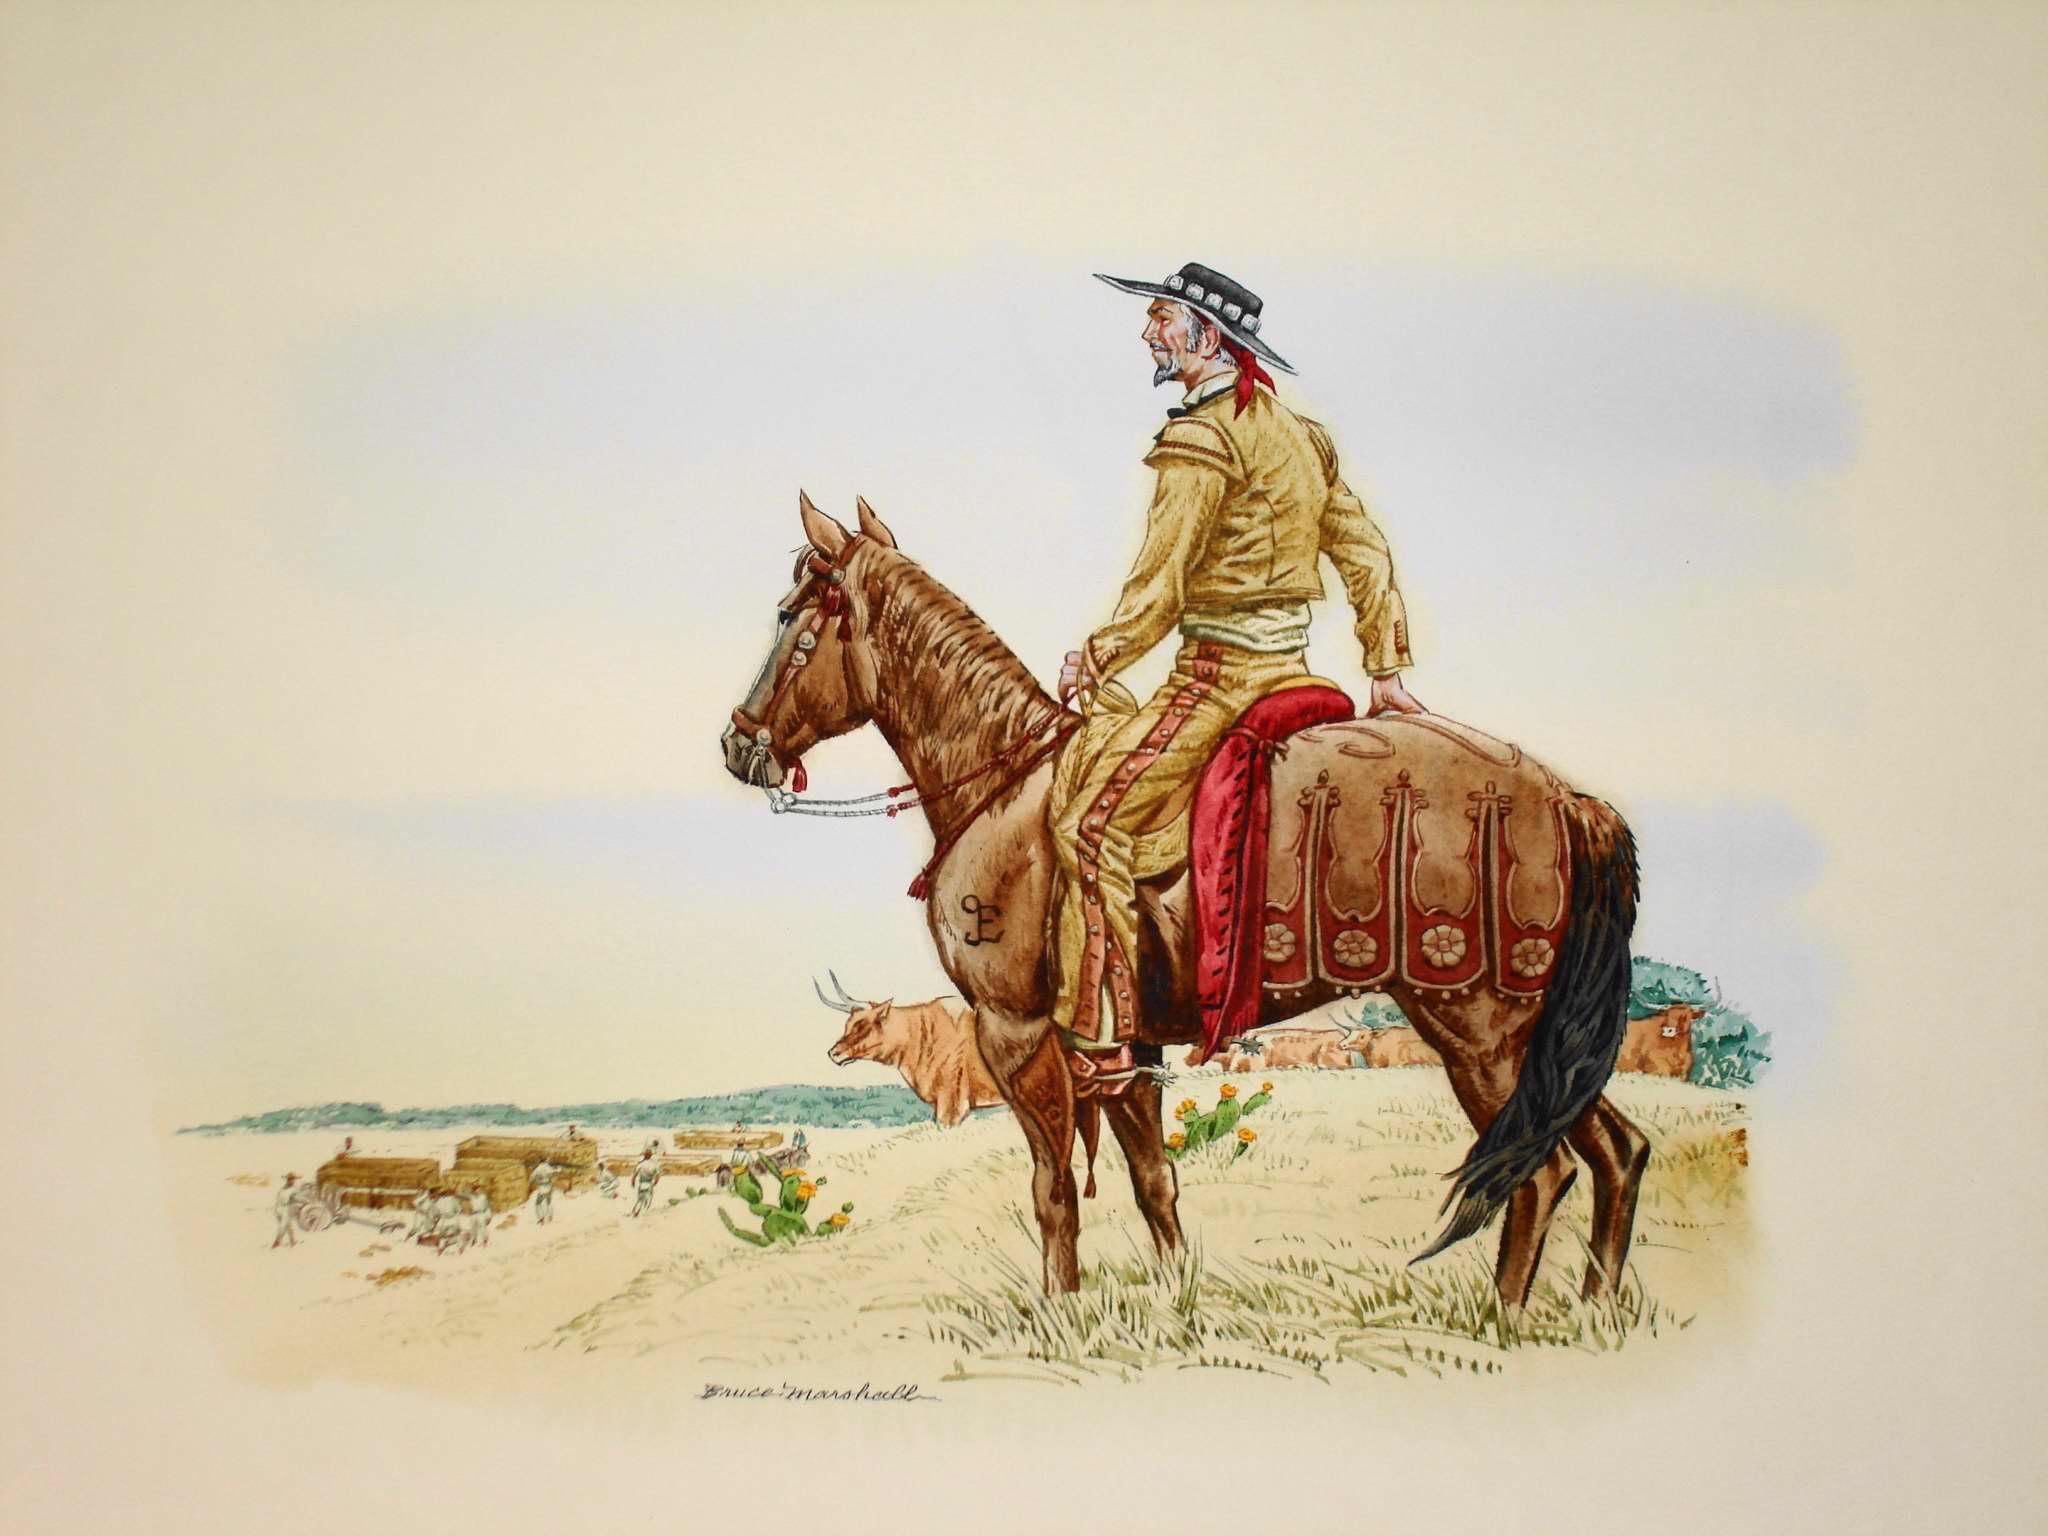 Object: Painting (Martin DeLeon Building Victoria, Texas, 1824) | UTSA Institute Of Texan Cultures